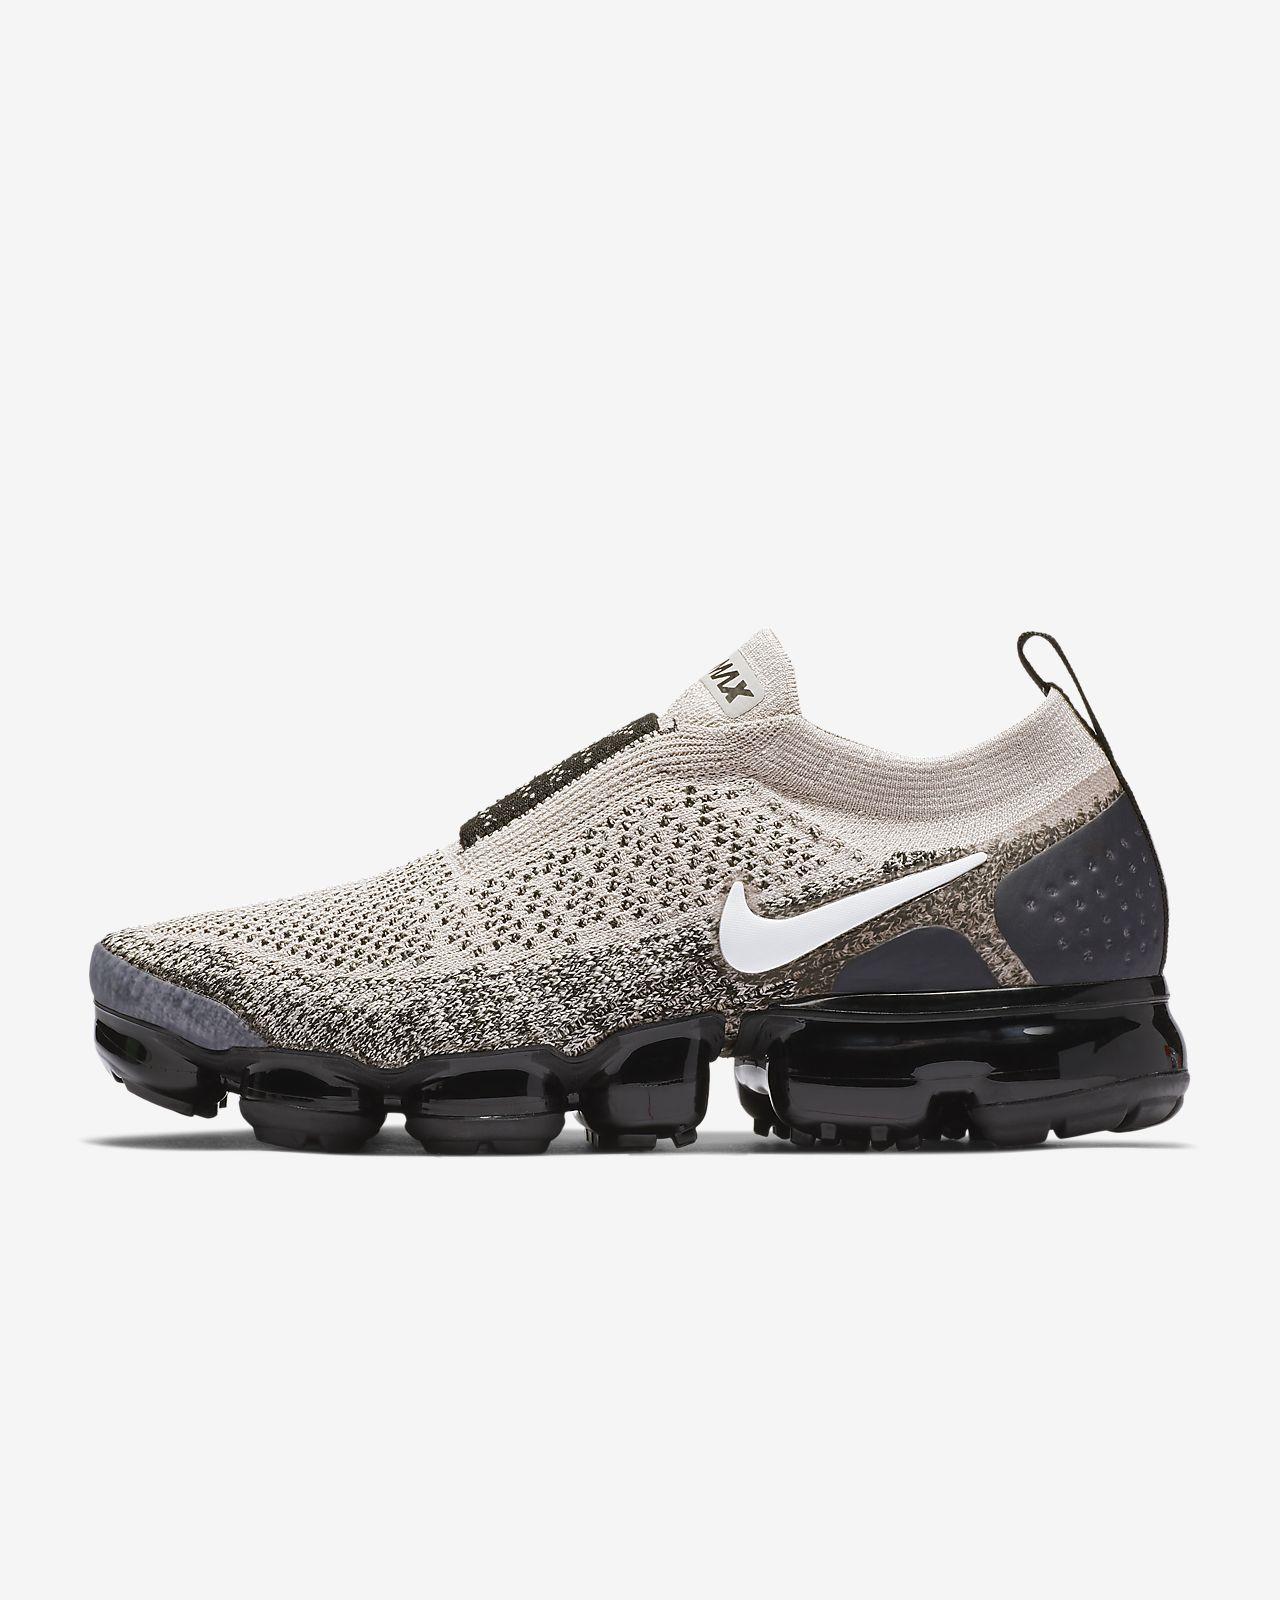 scarpe nike vapormax 2019 uomo